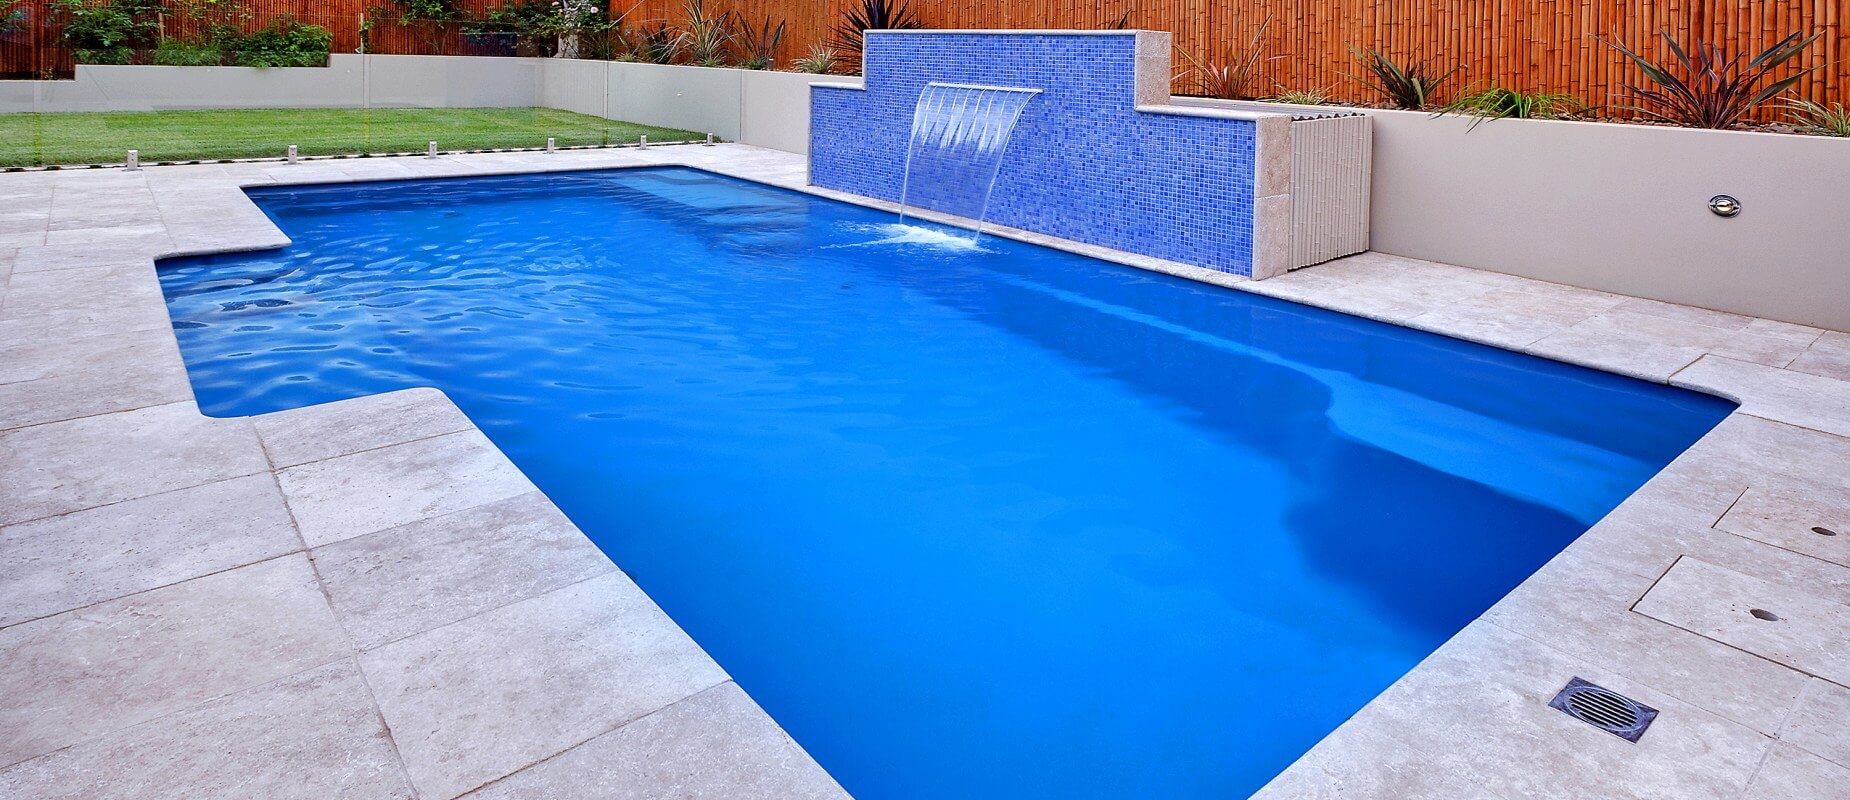 piscina de lux modele frumoase 28